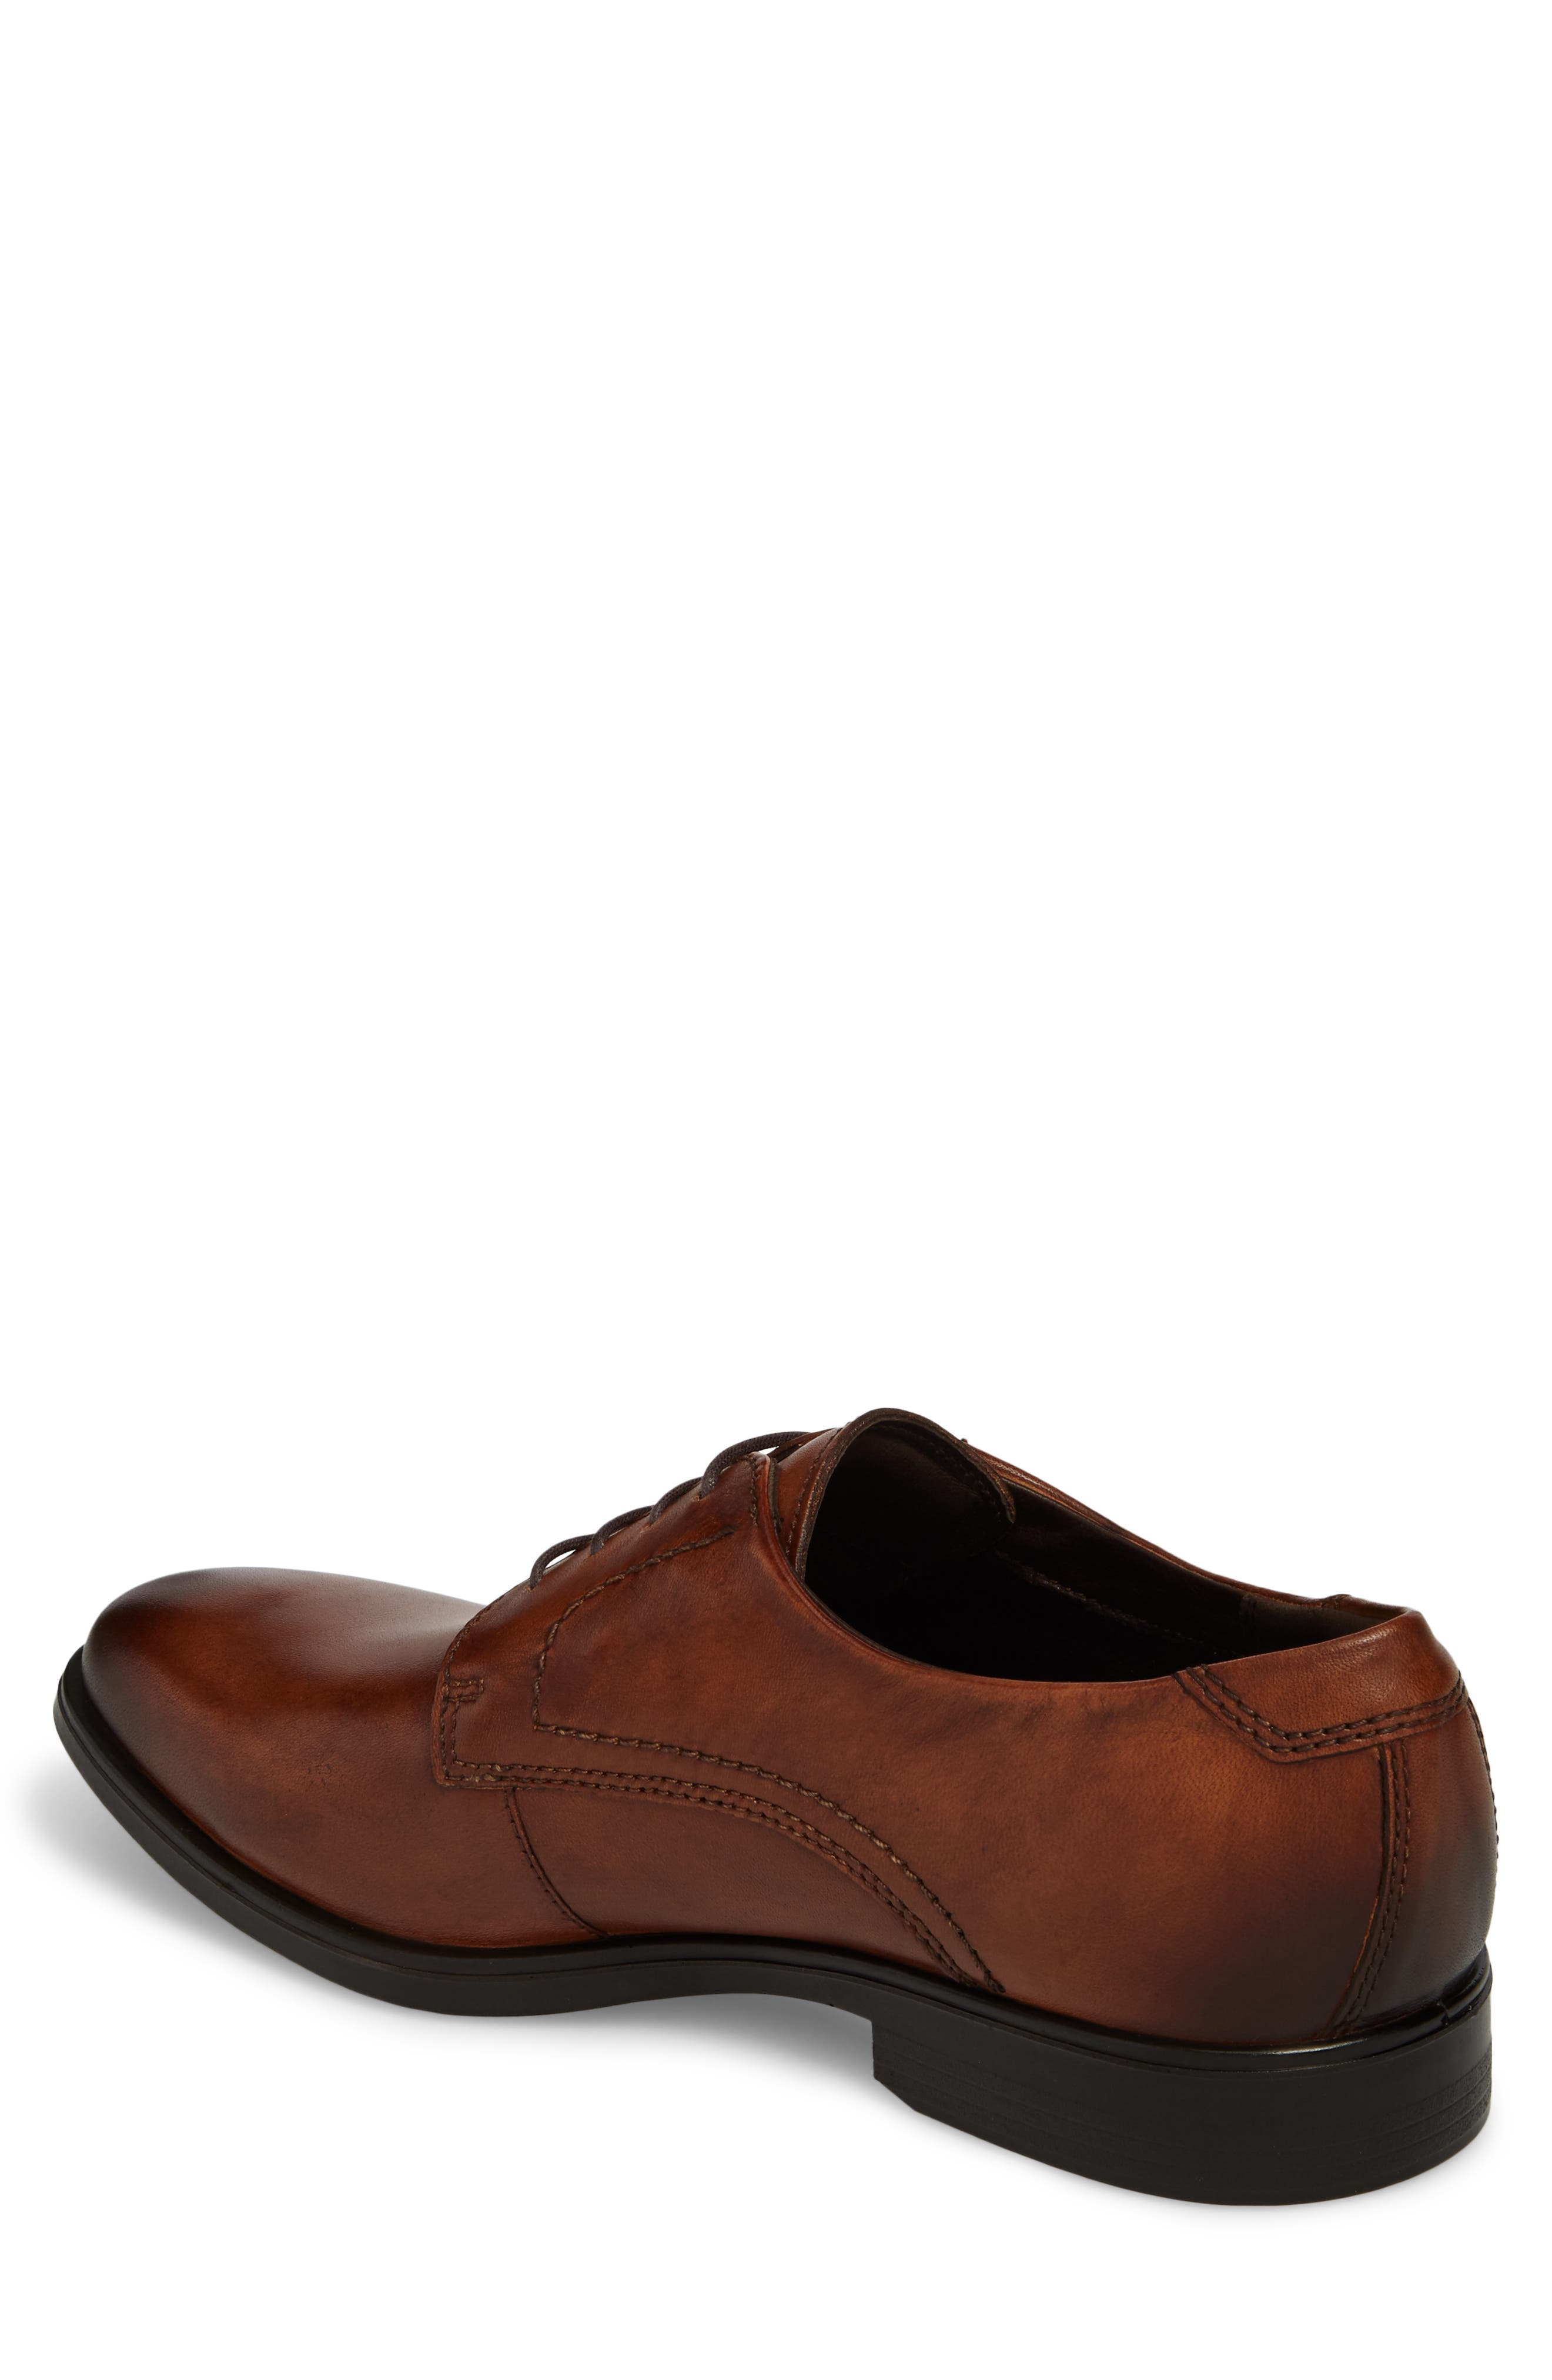 Melbourne Plain Toe Derby,                             Alternate thumbnail 2, color,                             Amber Leather